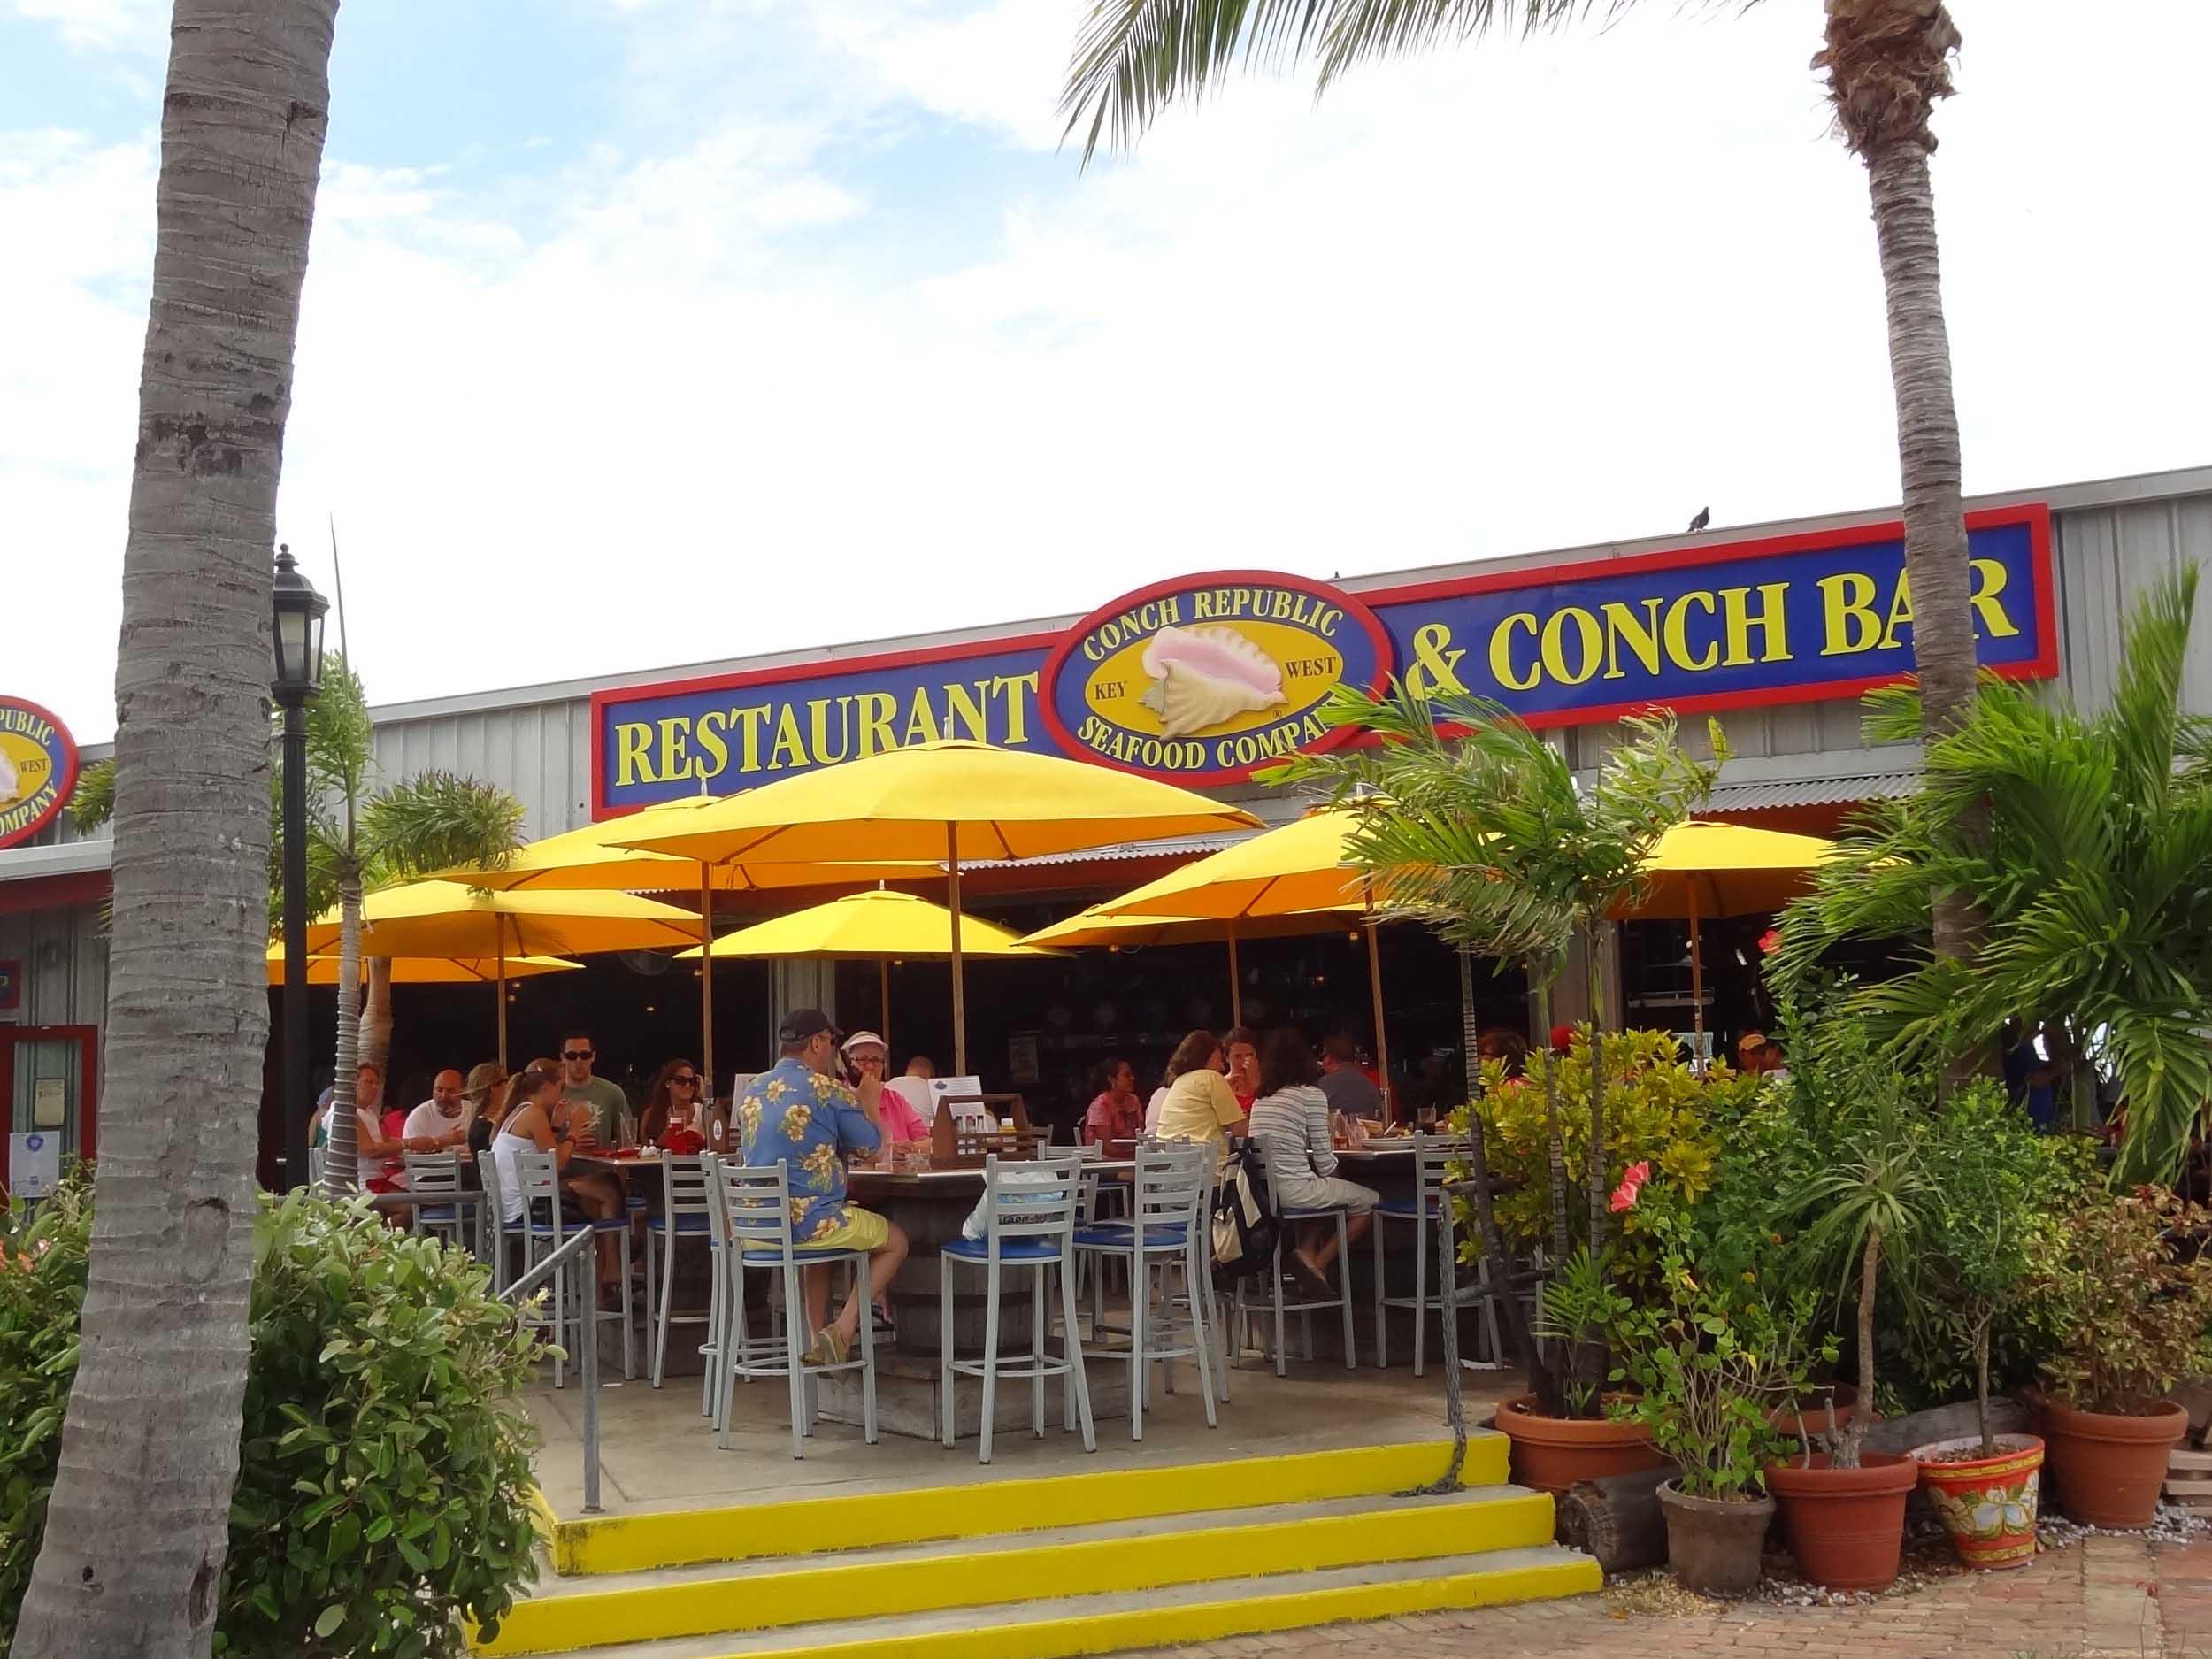 Conch Republic Seafood Company Outside Patio